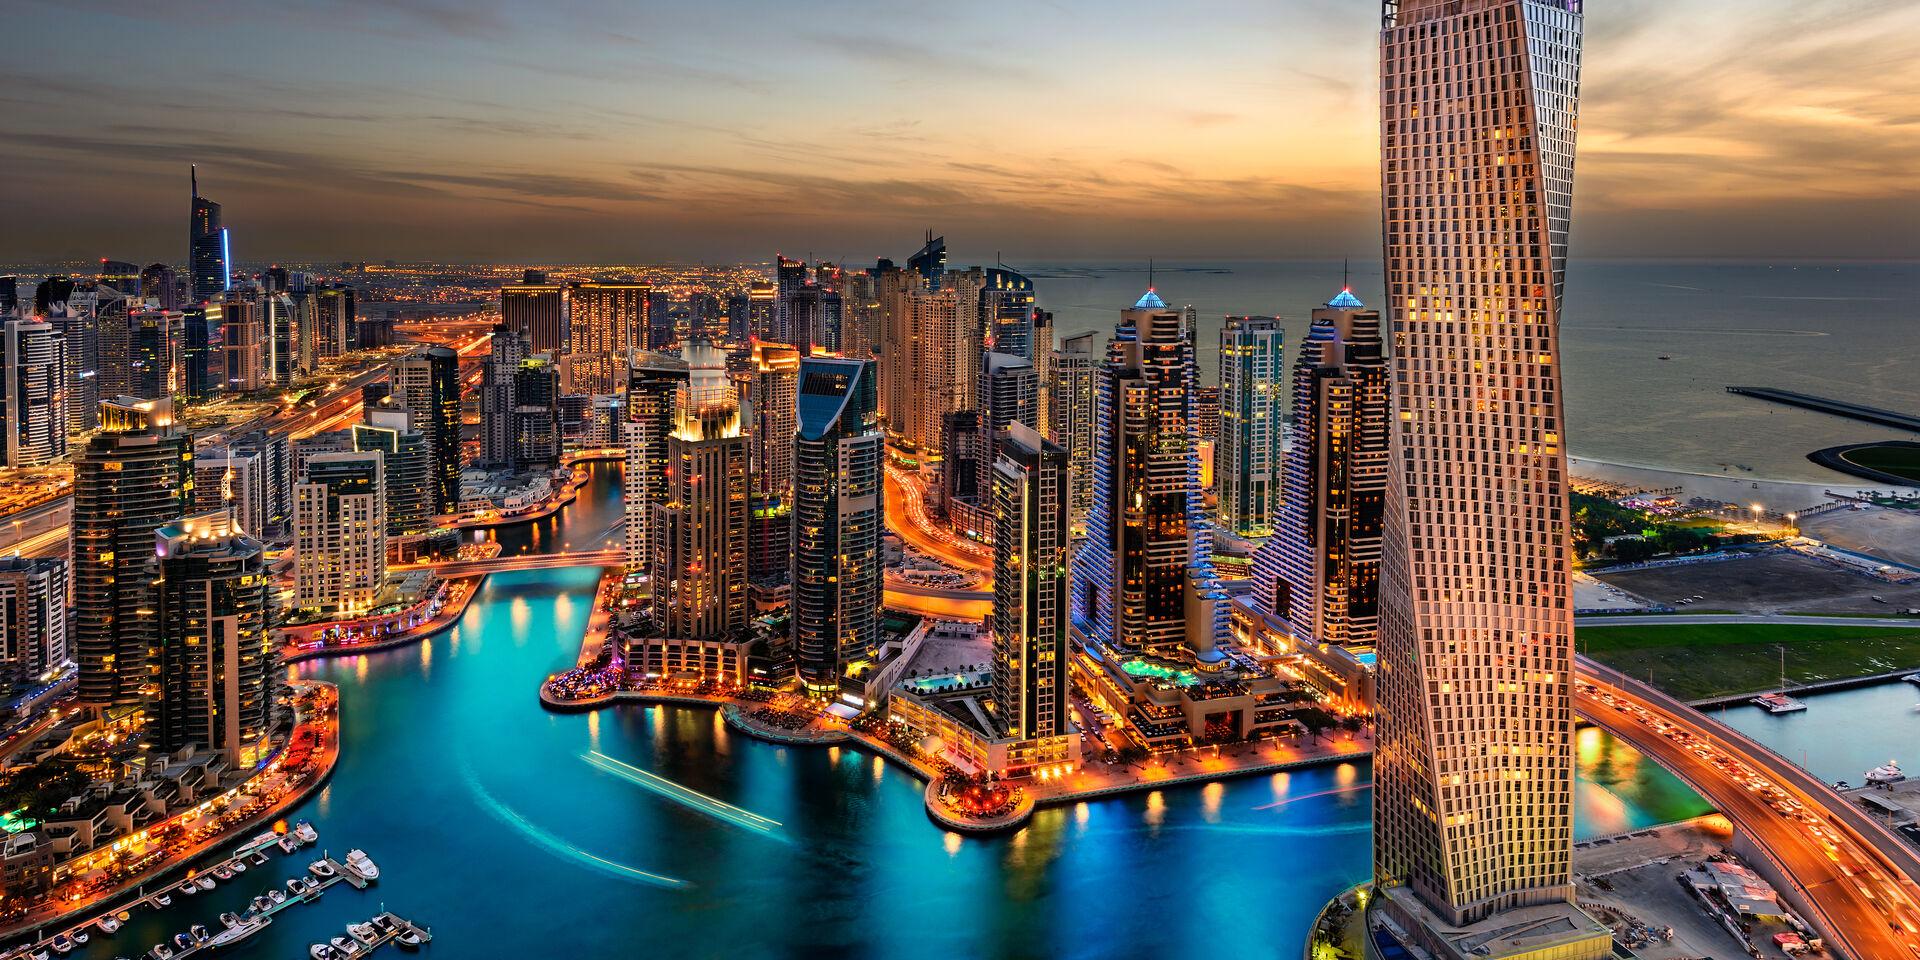 Már kóser hús is elérhető Dubajban